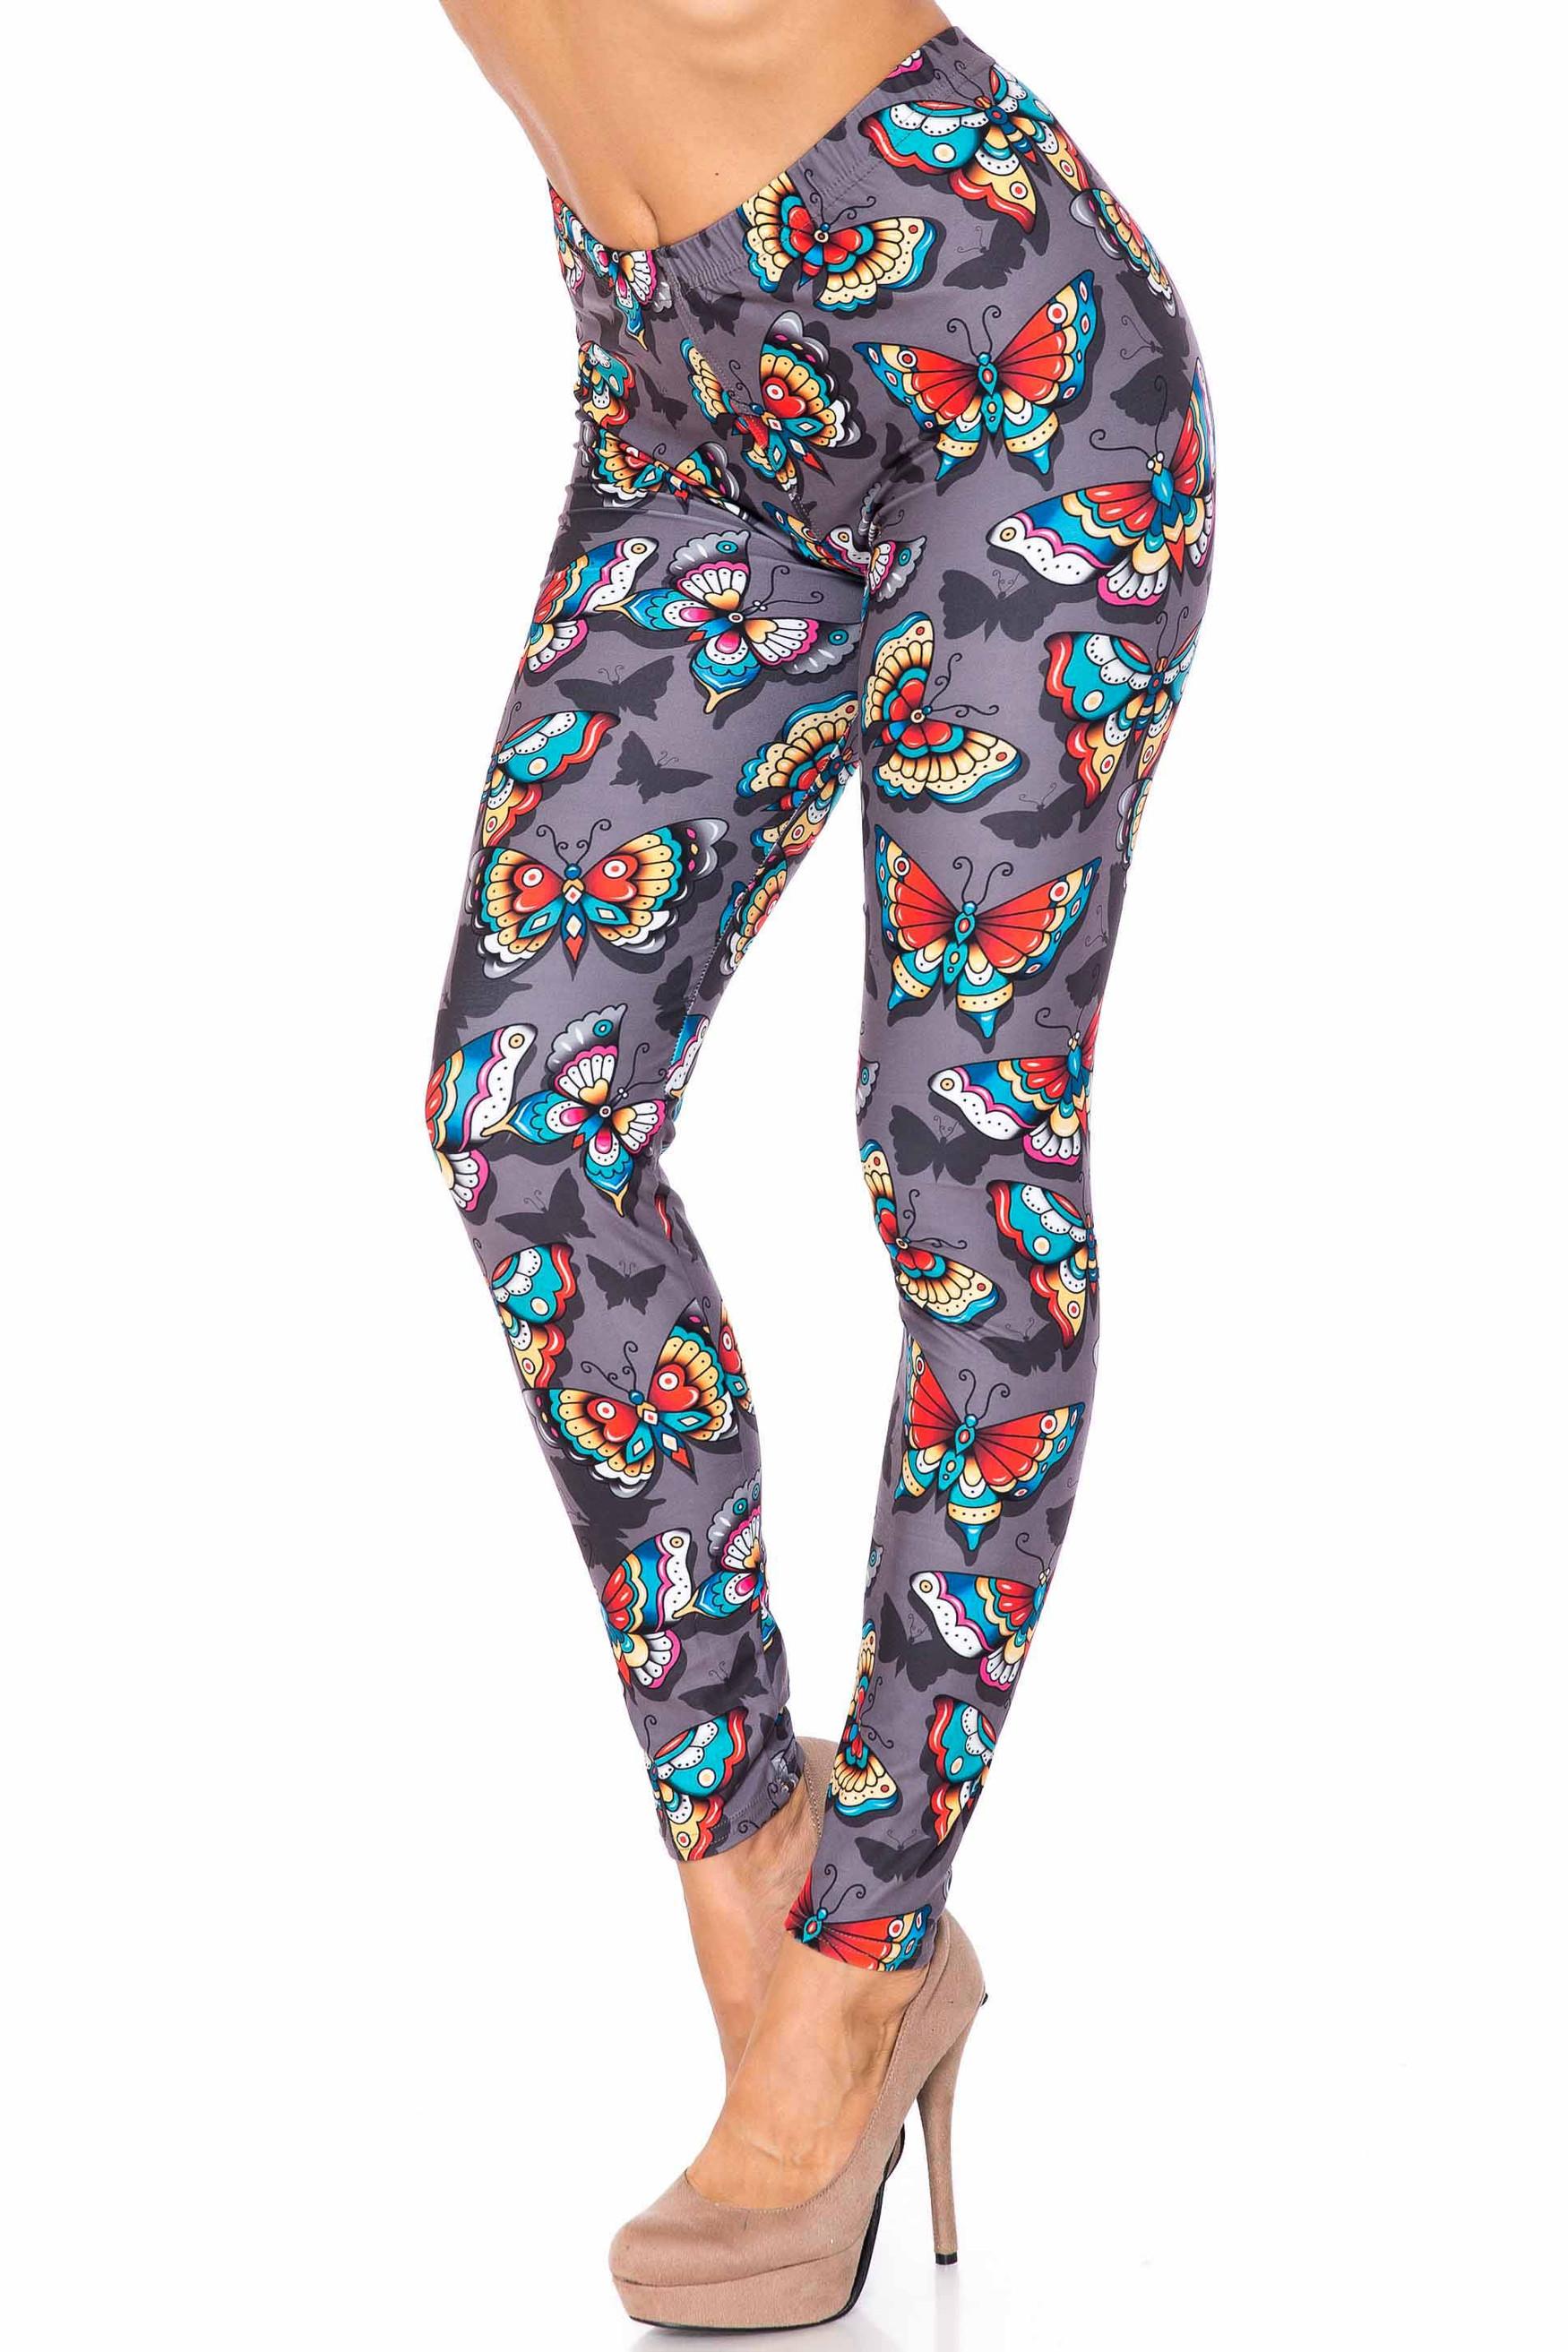 Creamy Soft Jewel Tone Butterfly Leggings - USA Fashion™